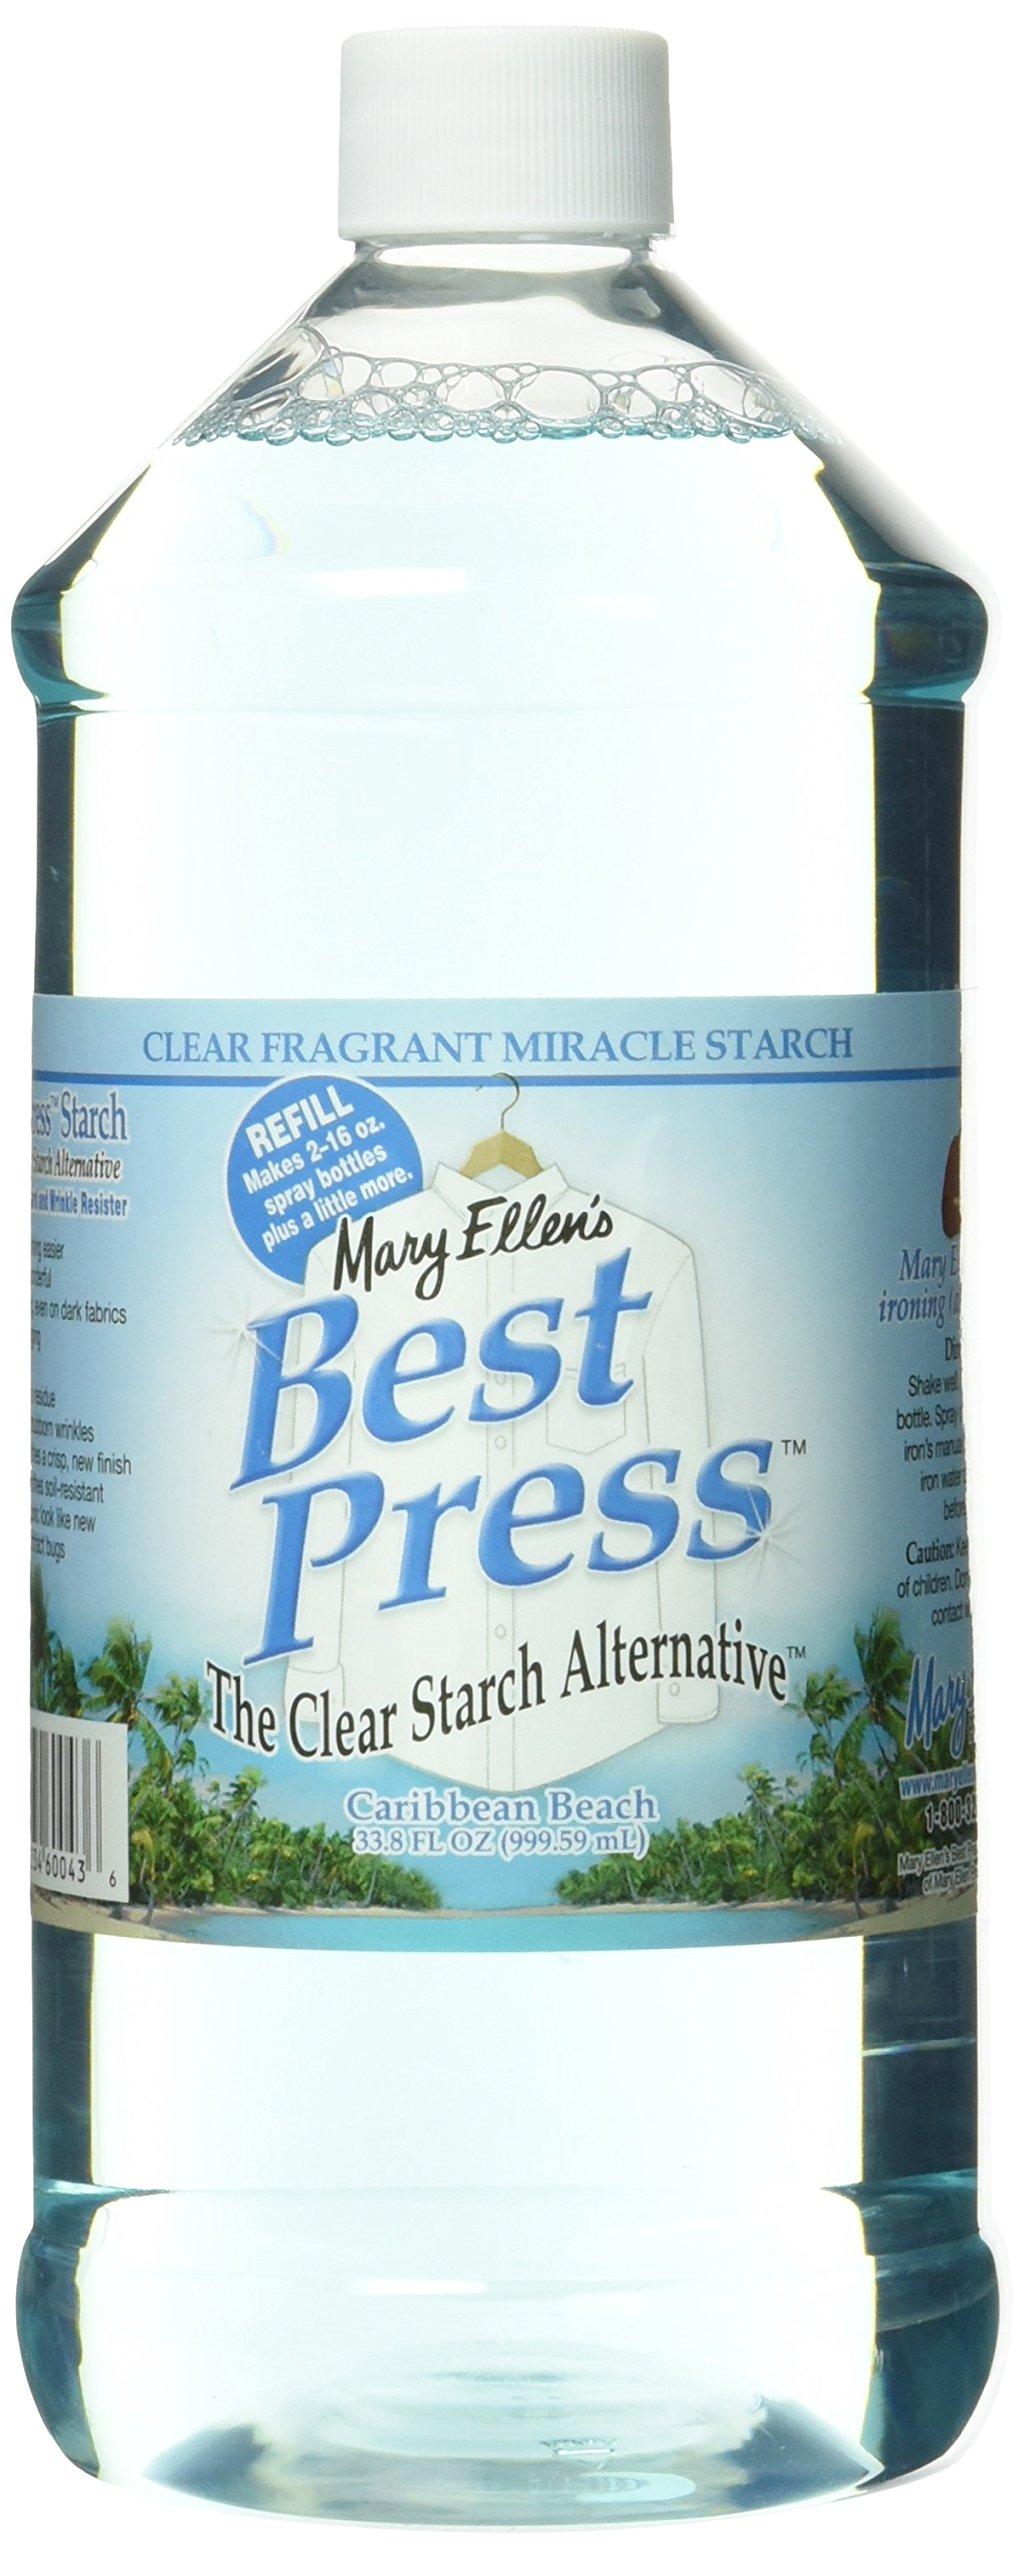 Mary Ellen's Best Press Refills 32 Ounces-Caribbean by Mary Ellen Products